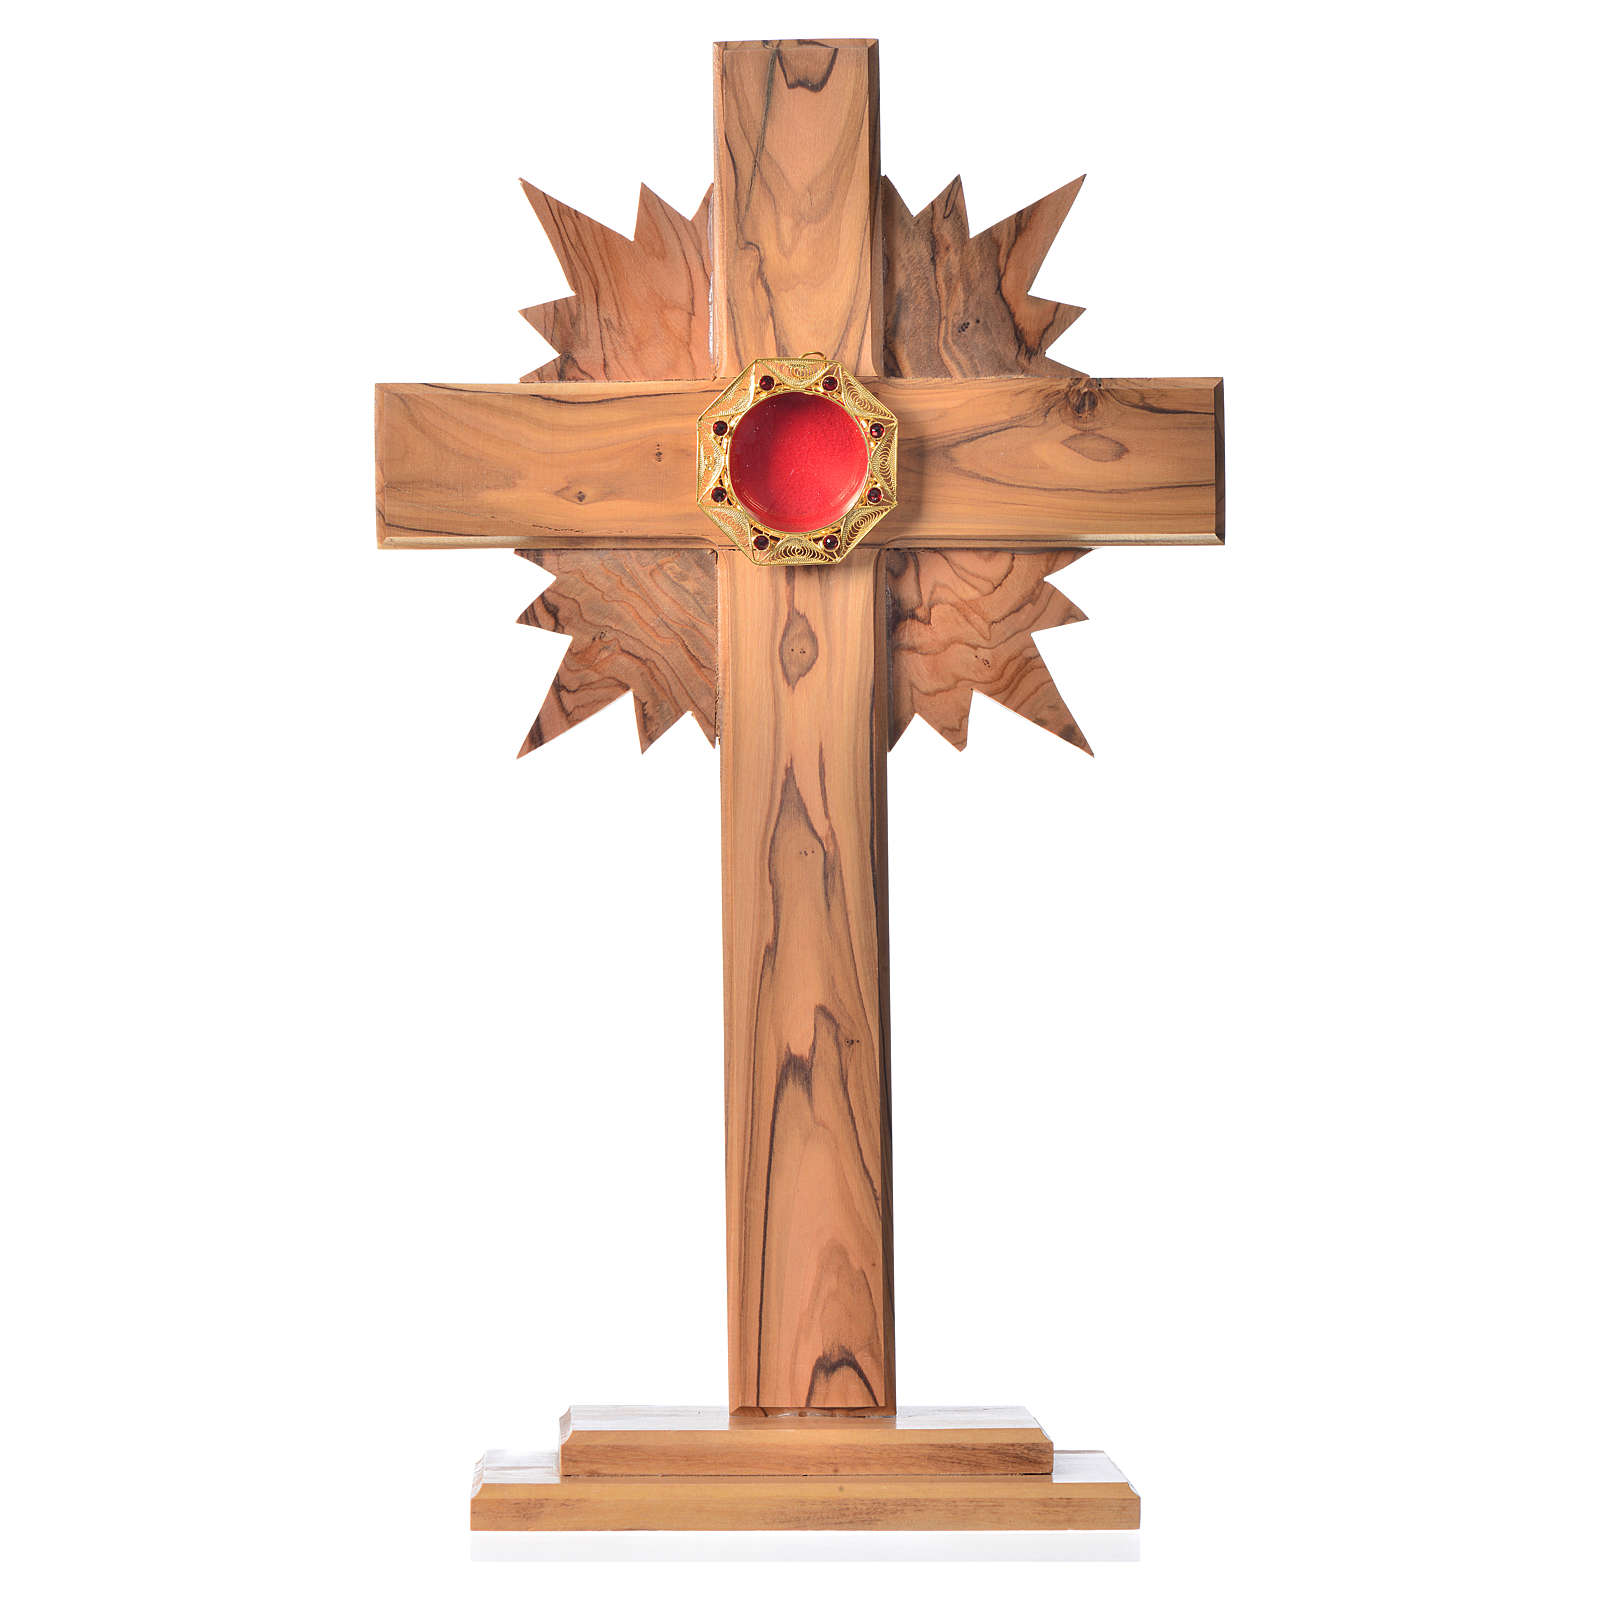 Relicario olivo cruz rayos 29cm, custodia octagonal plata 800 4